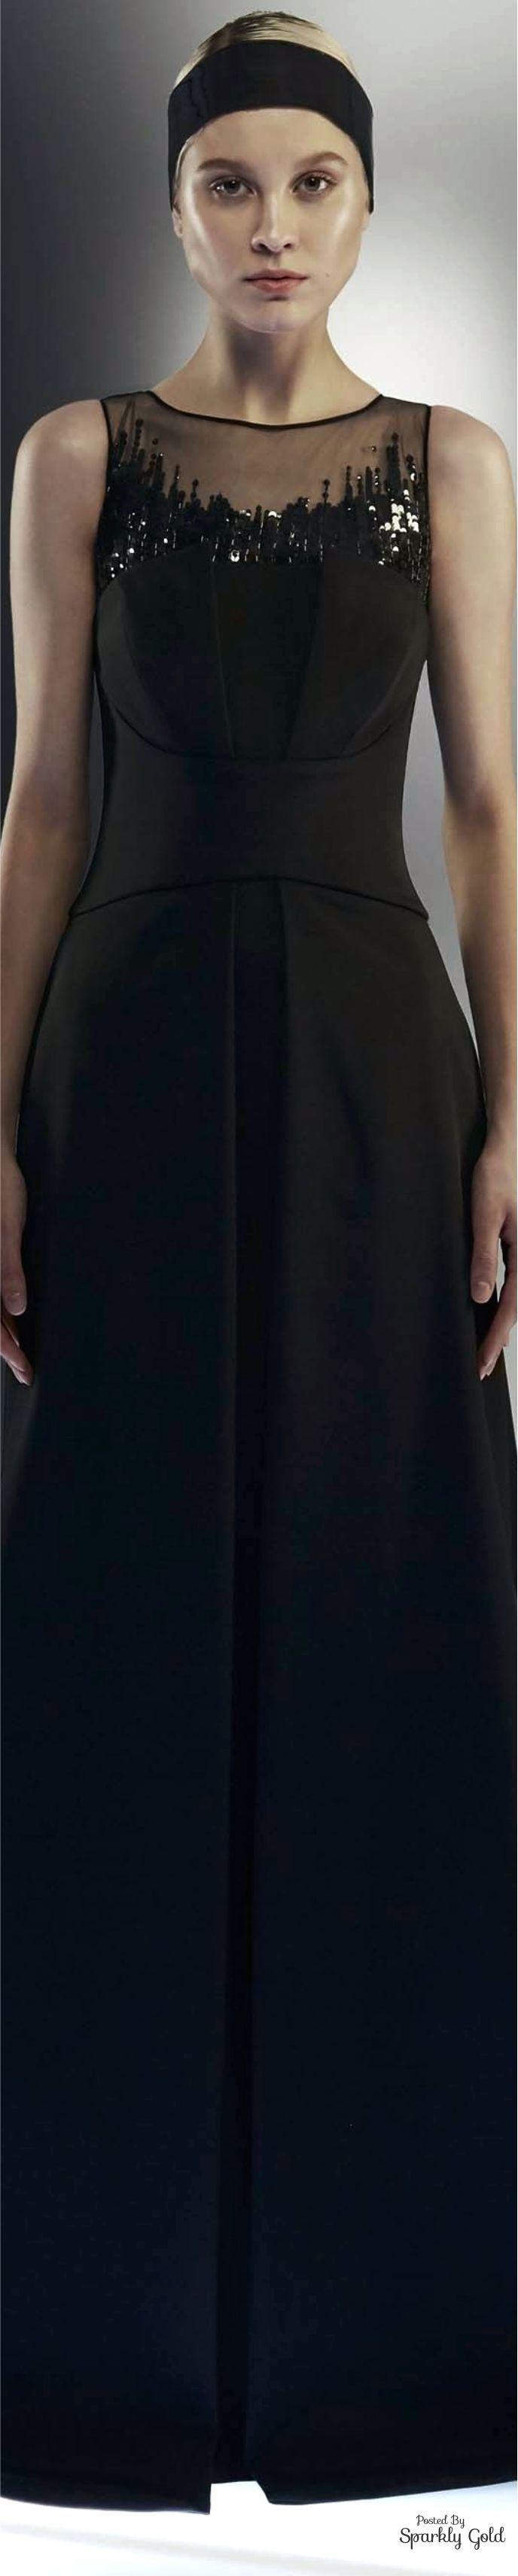 best платье т images on pinterest ball dresses bridesmaid